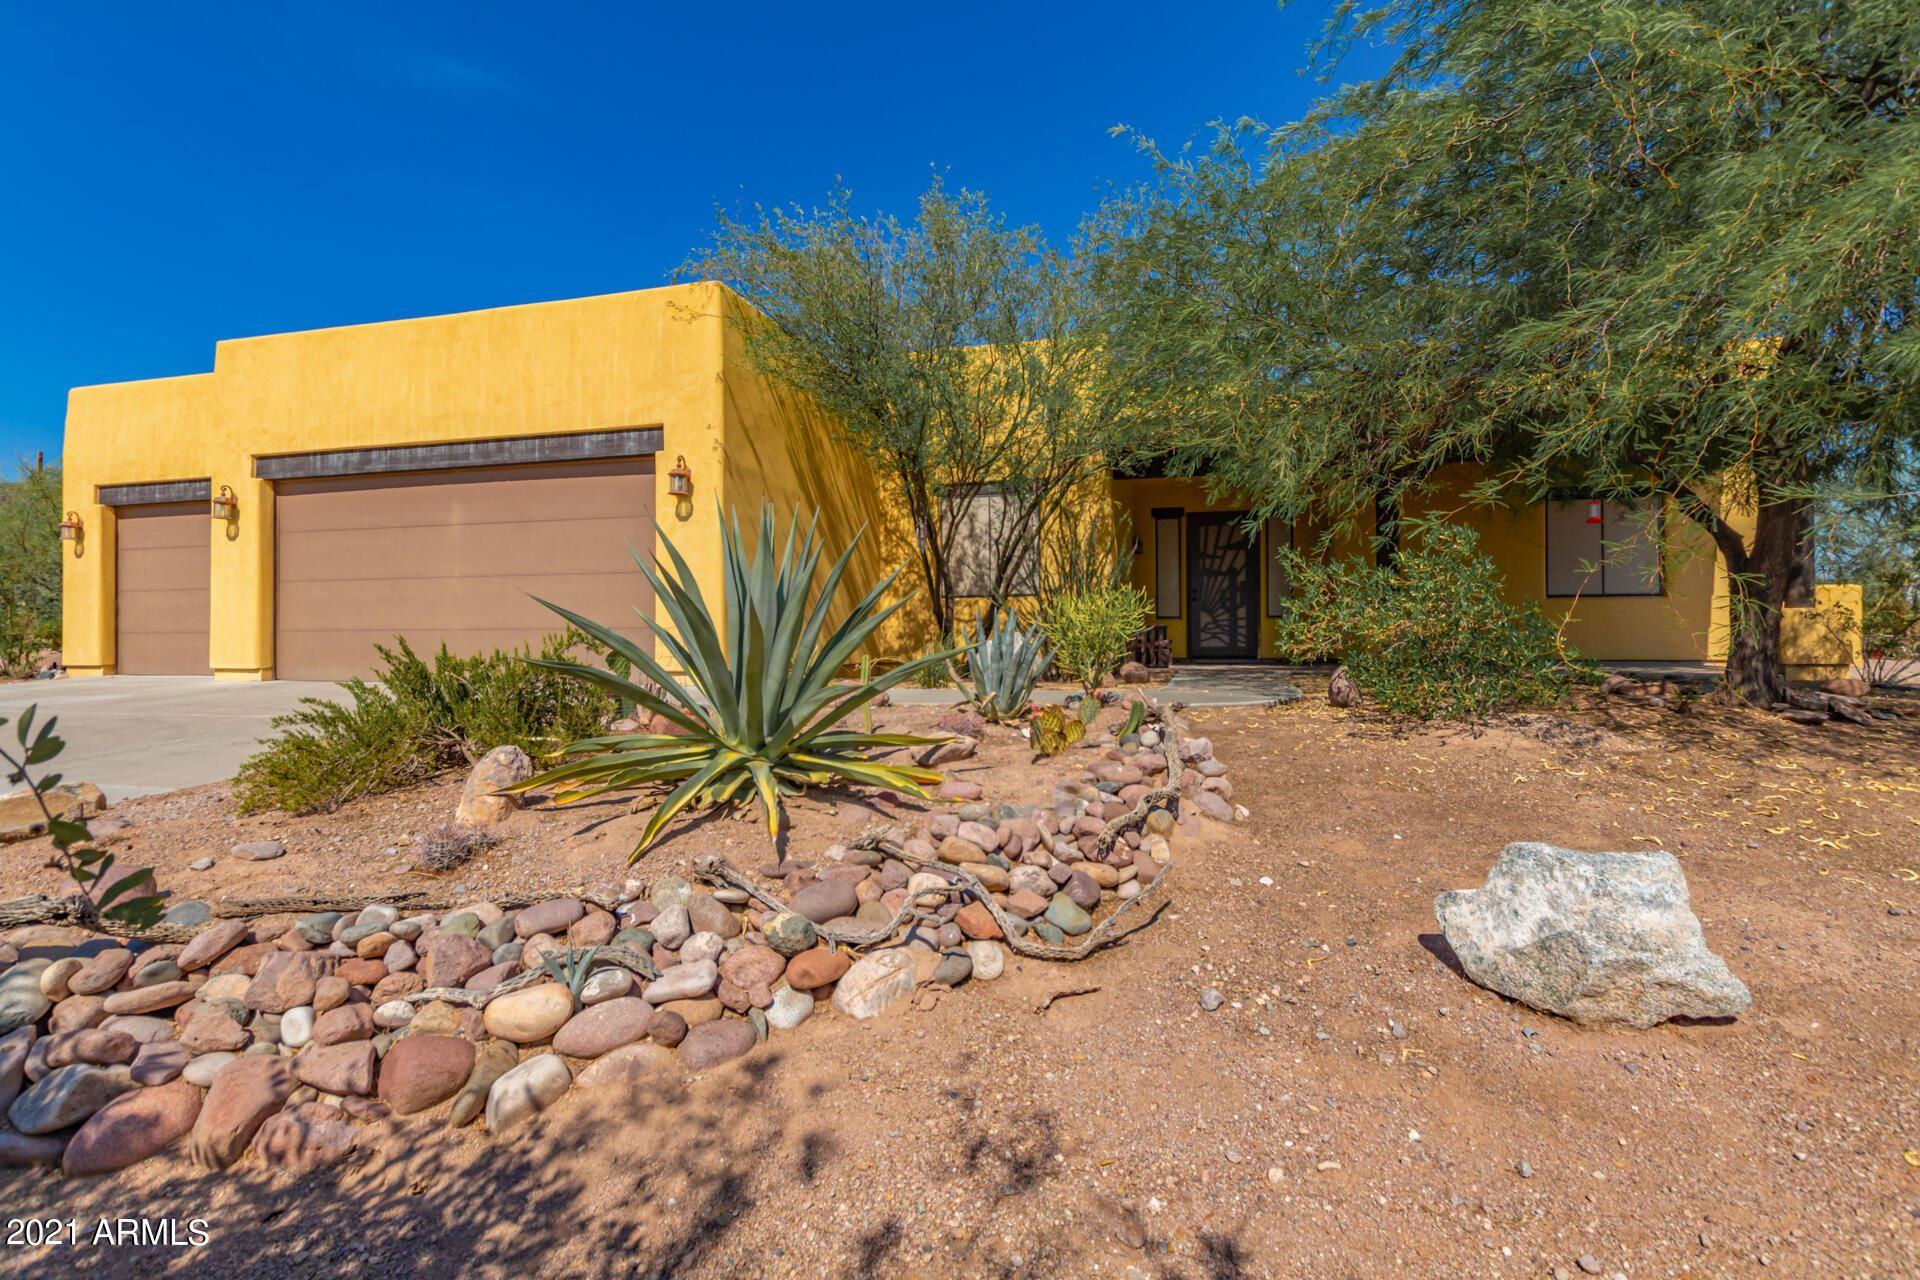 1651 S MOUNTAIN VIEW Road, Apache Junction, AZ 85119 - MLS#: 6261847